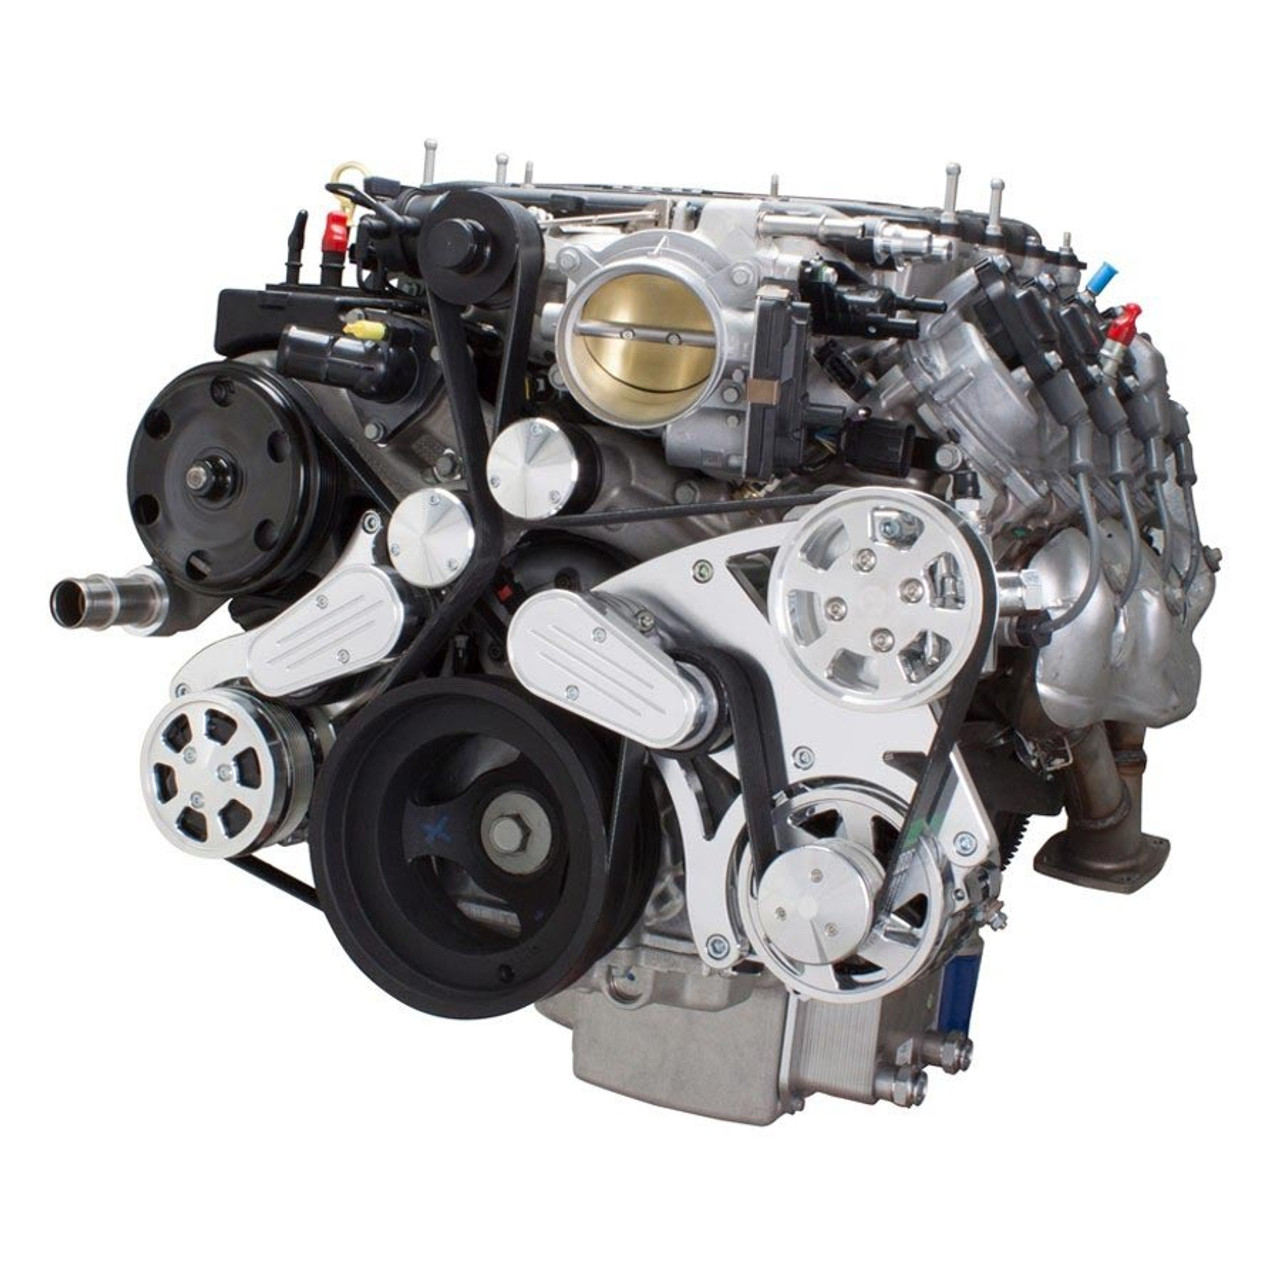 Serpentine System for LT4 Supercharged Generation V - AC, Power Steering &  Alternator - All ...